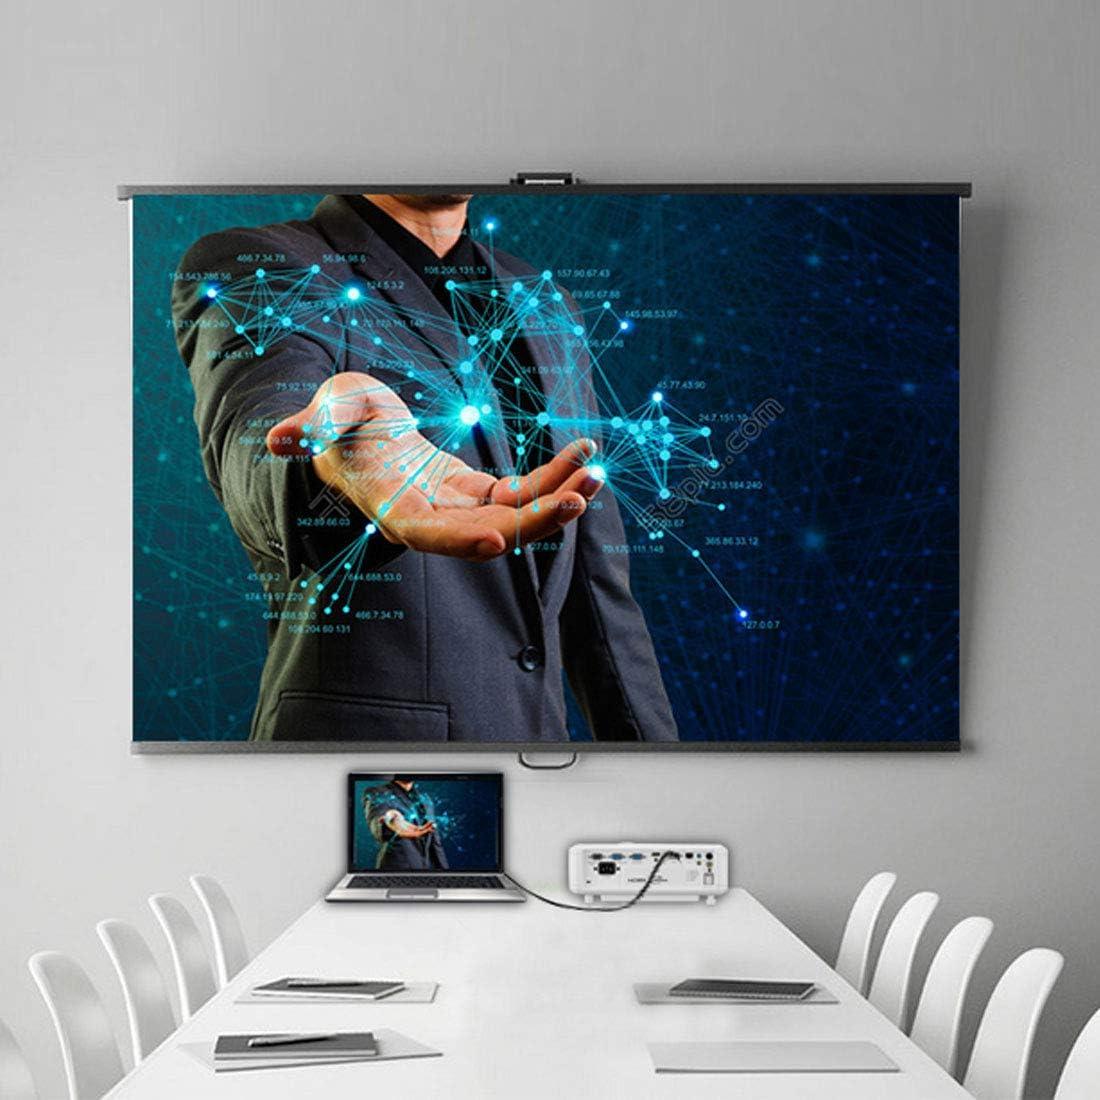 20m 65ft HDMI 1.4-Ultra High Speed 5Gbps-Video 4K 3D 1080P-TV Projectors,DVD